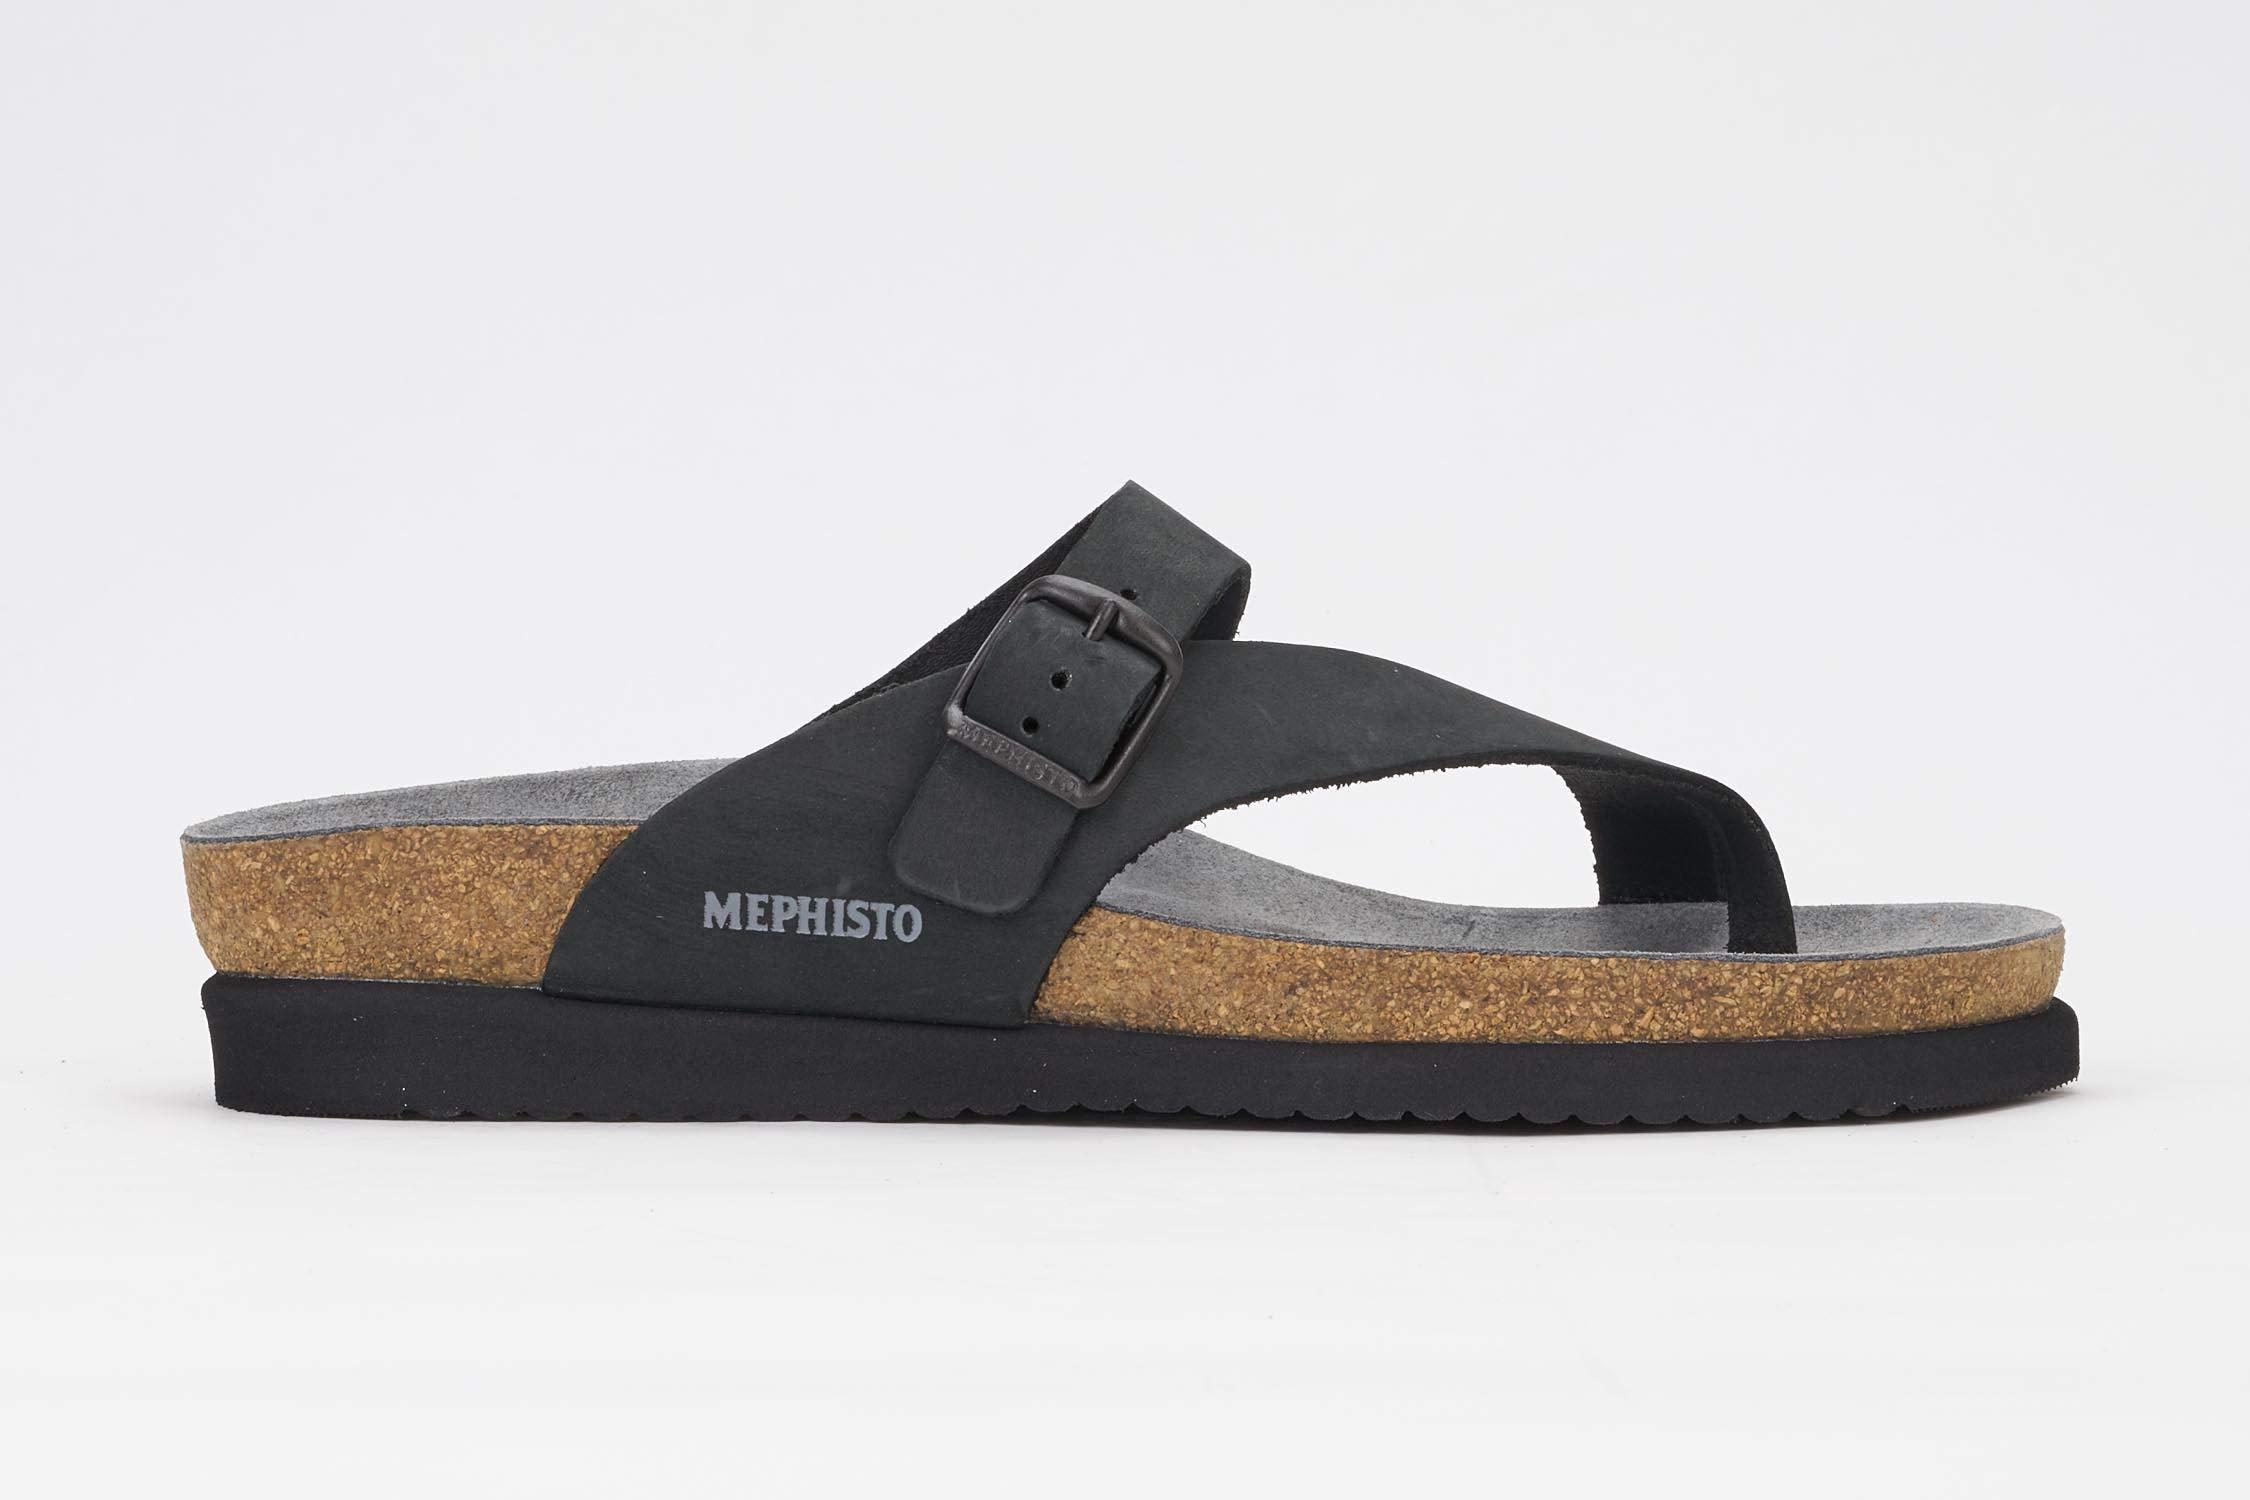 Mephisto Women's Helen Thong Sandal,Black Nubuck,8 M US by Mephisto